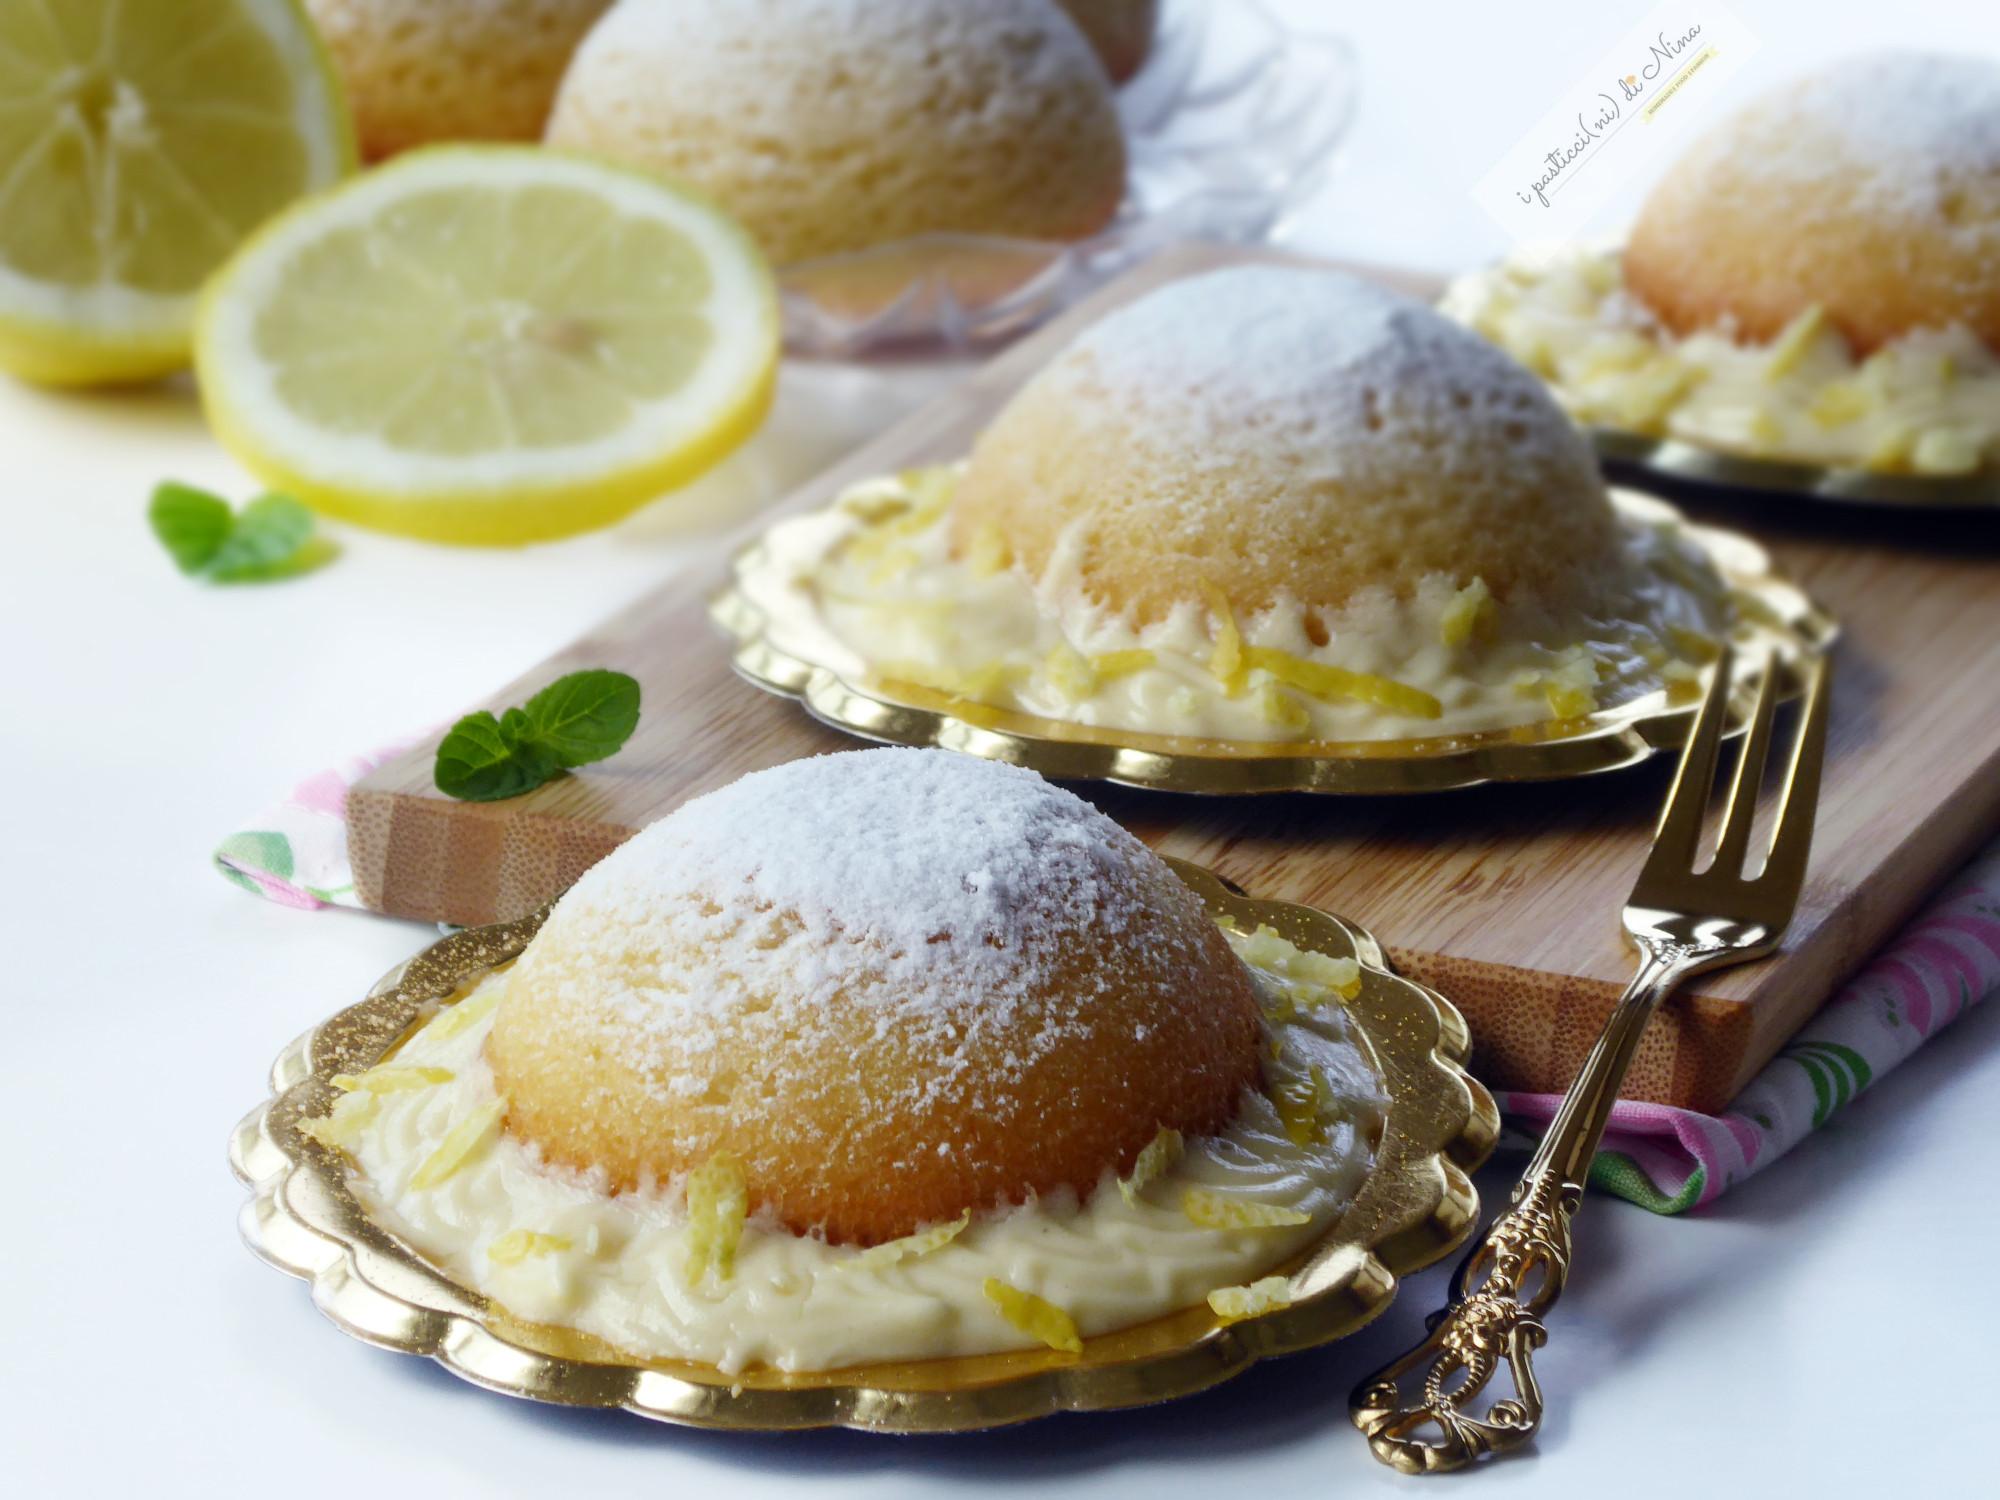 Semisfere soffici con crema al limone chantilly